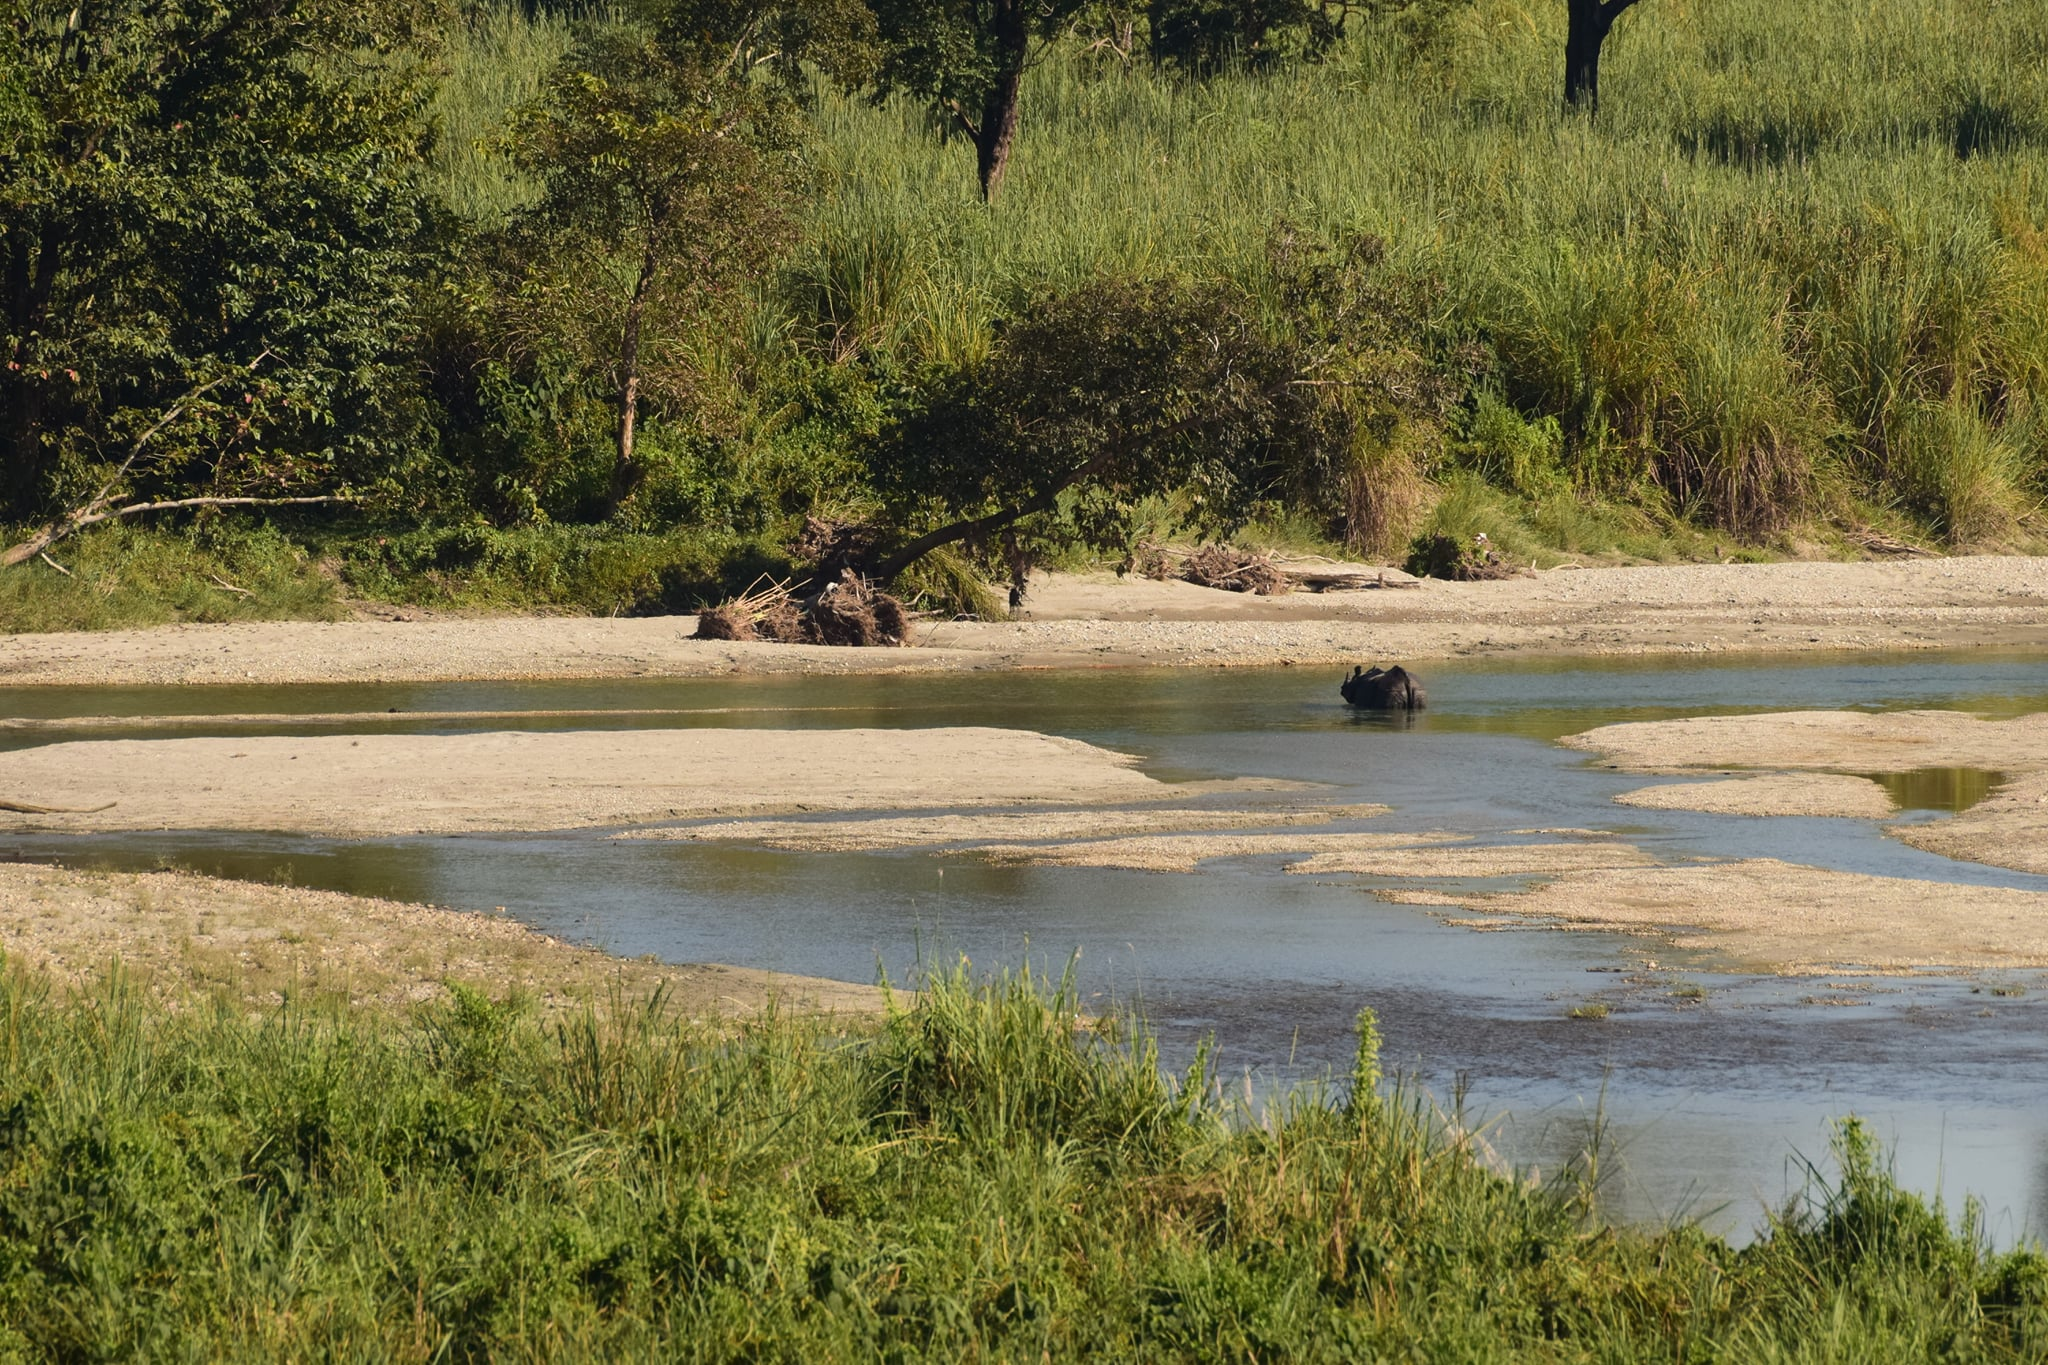 rhino-jatraprasad-watchtower